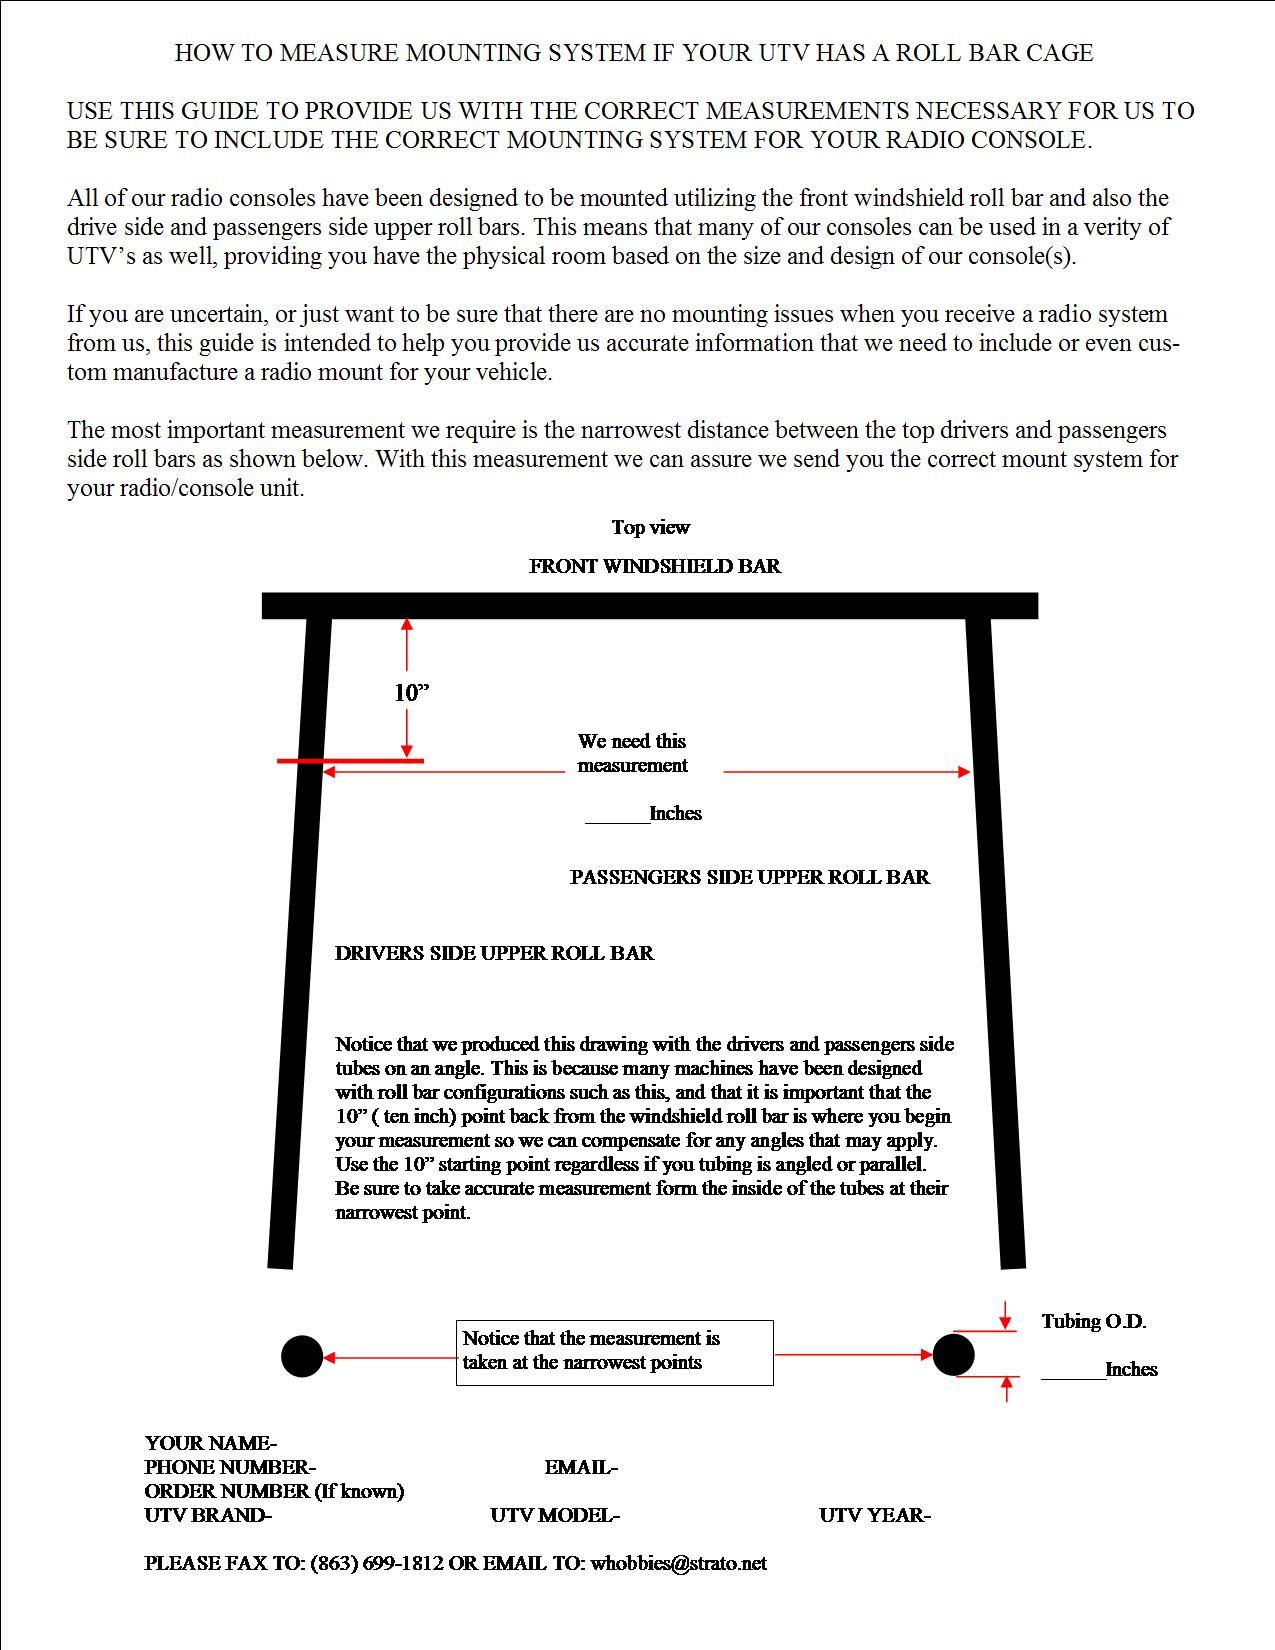 Golf Cart Brake Light Wiring Diagram : Ezgo golf cart headlight wiring diagram